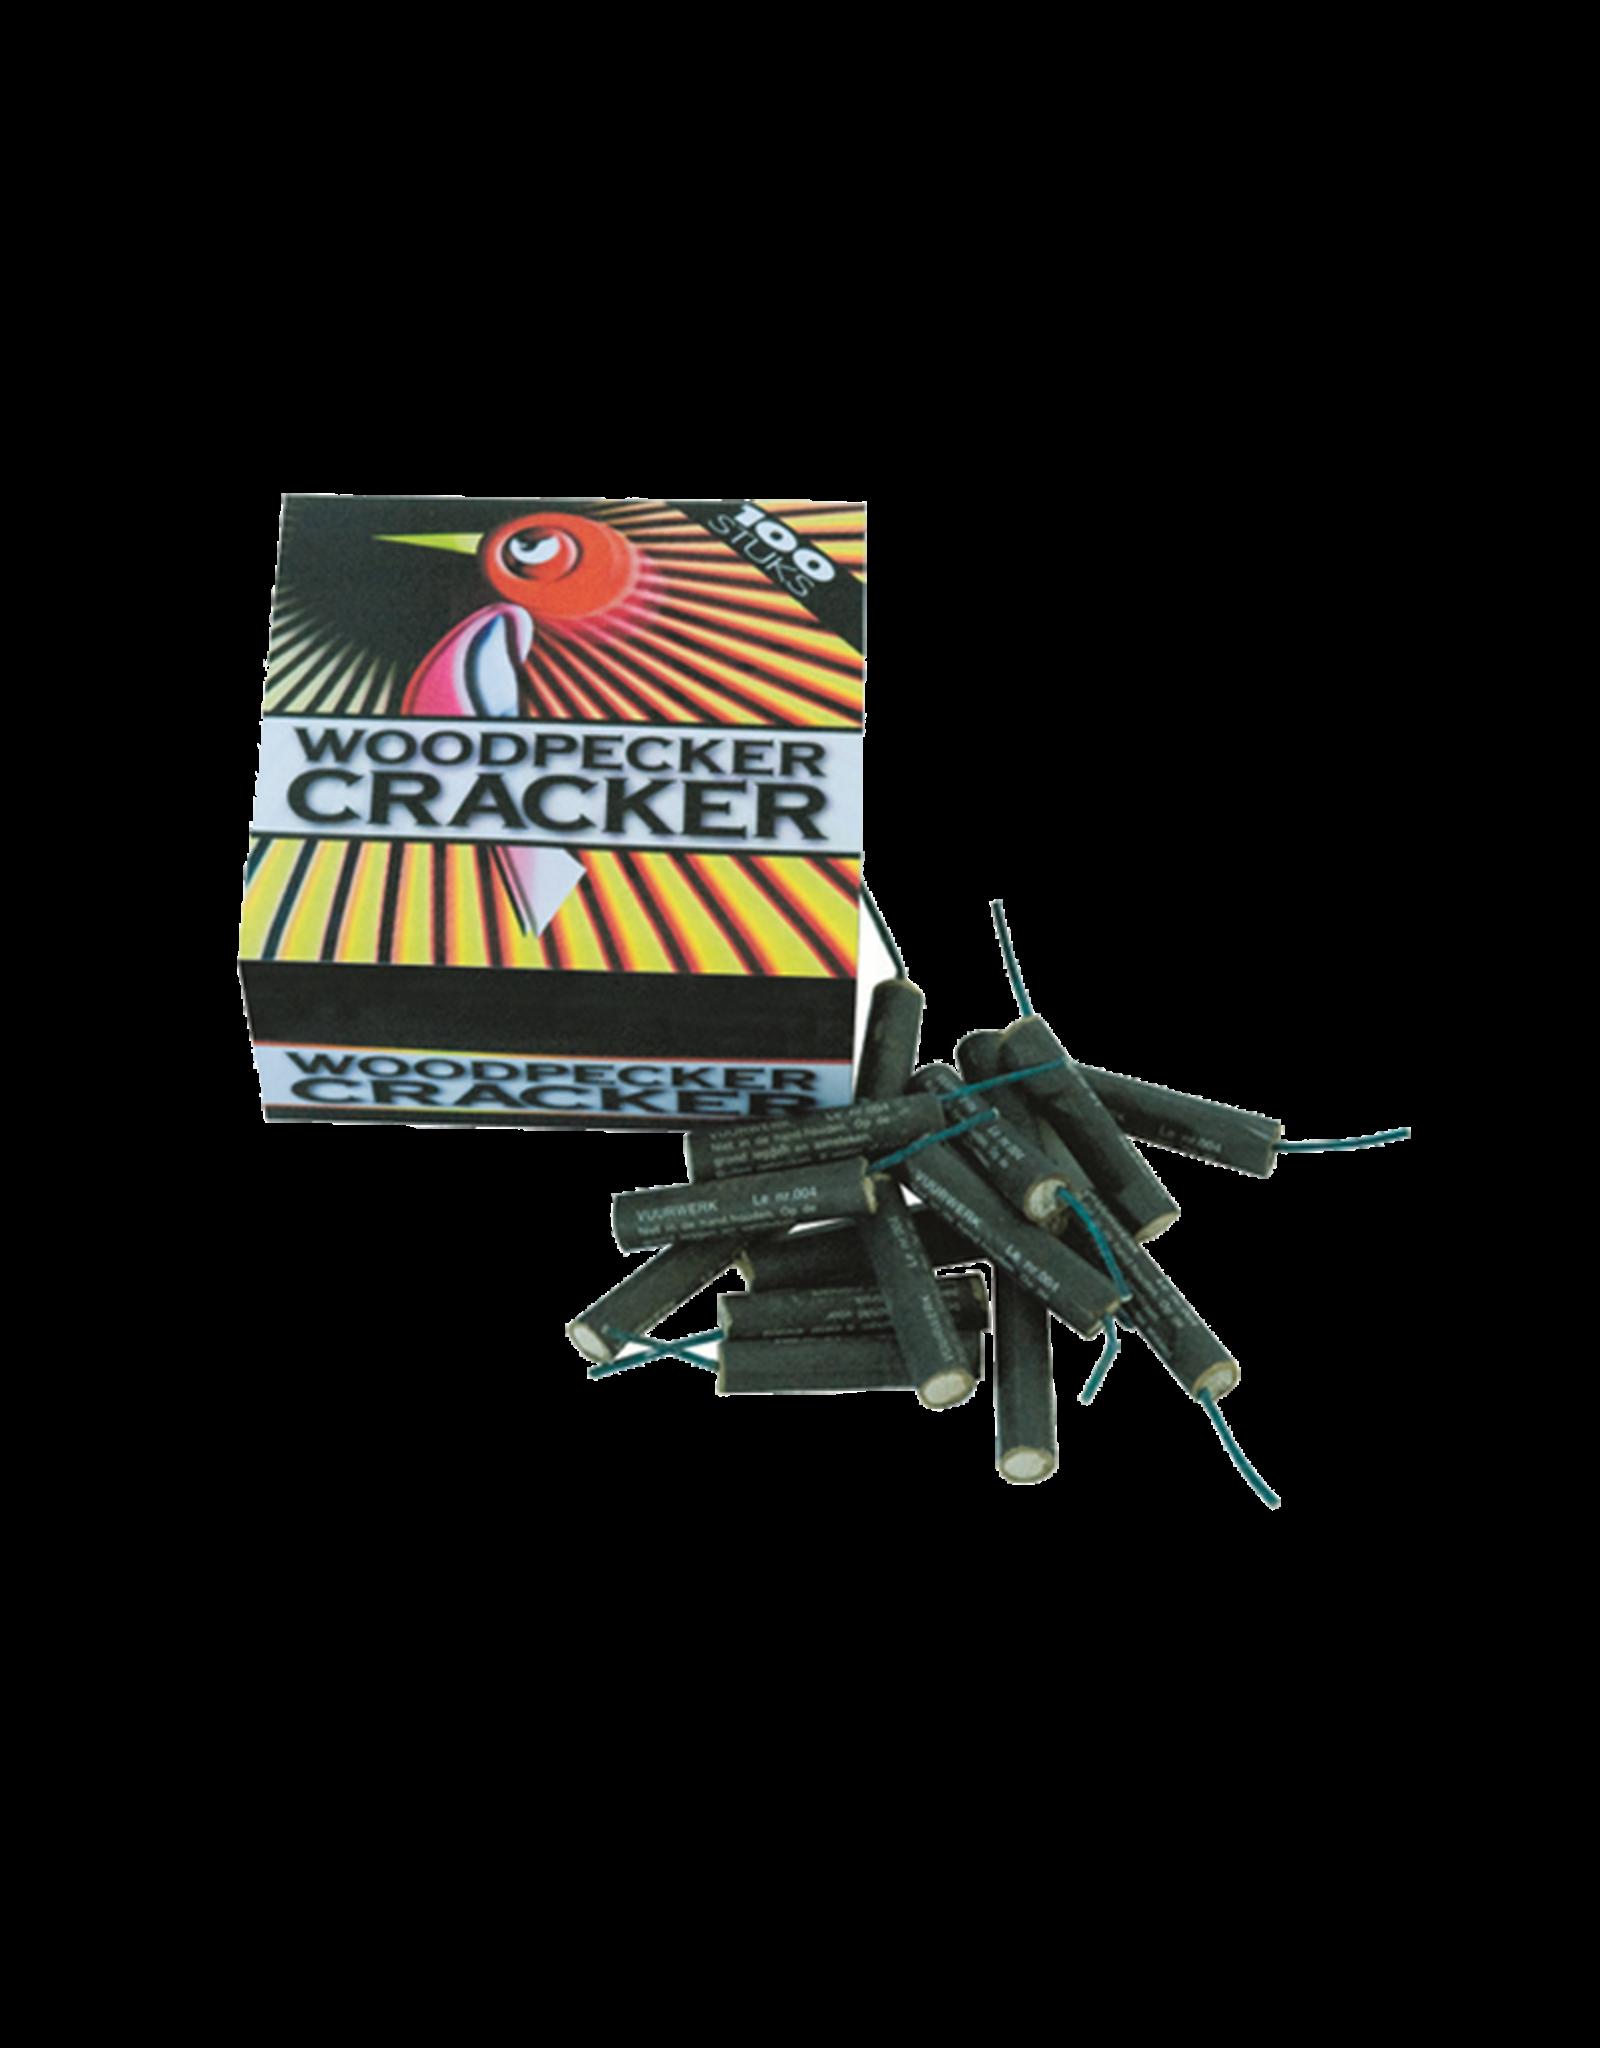 Lesli Vuurwerk  Woodpecker Cracker